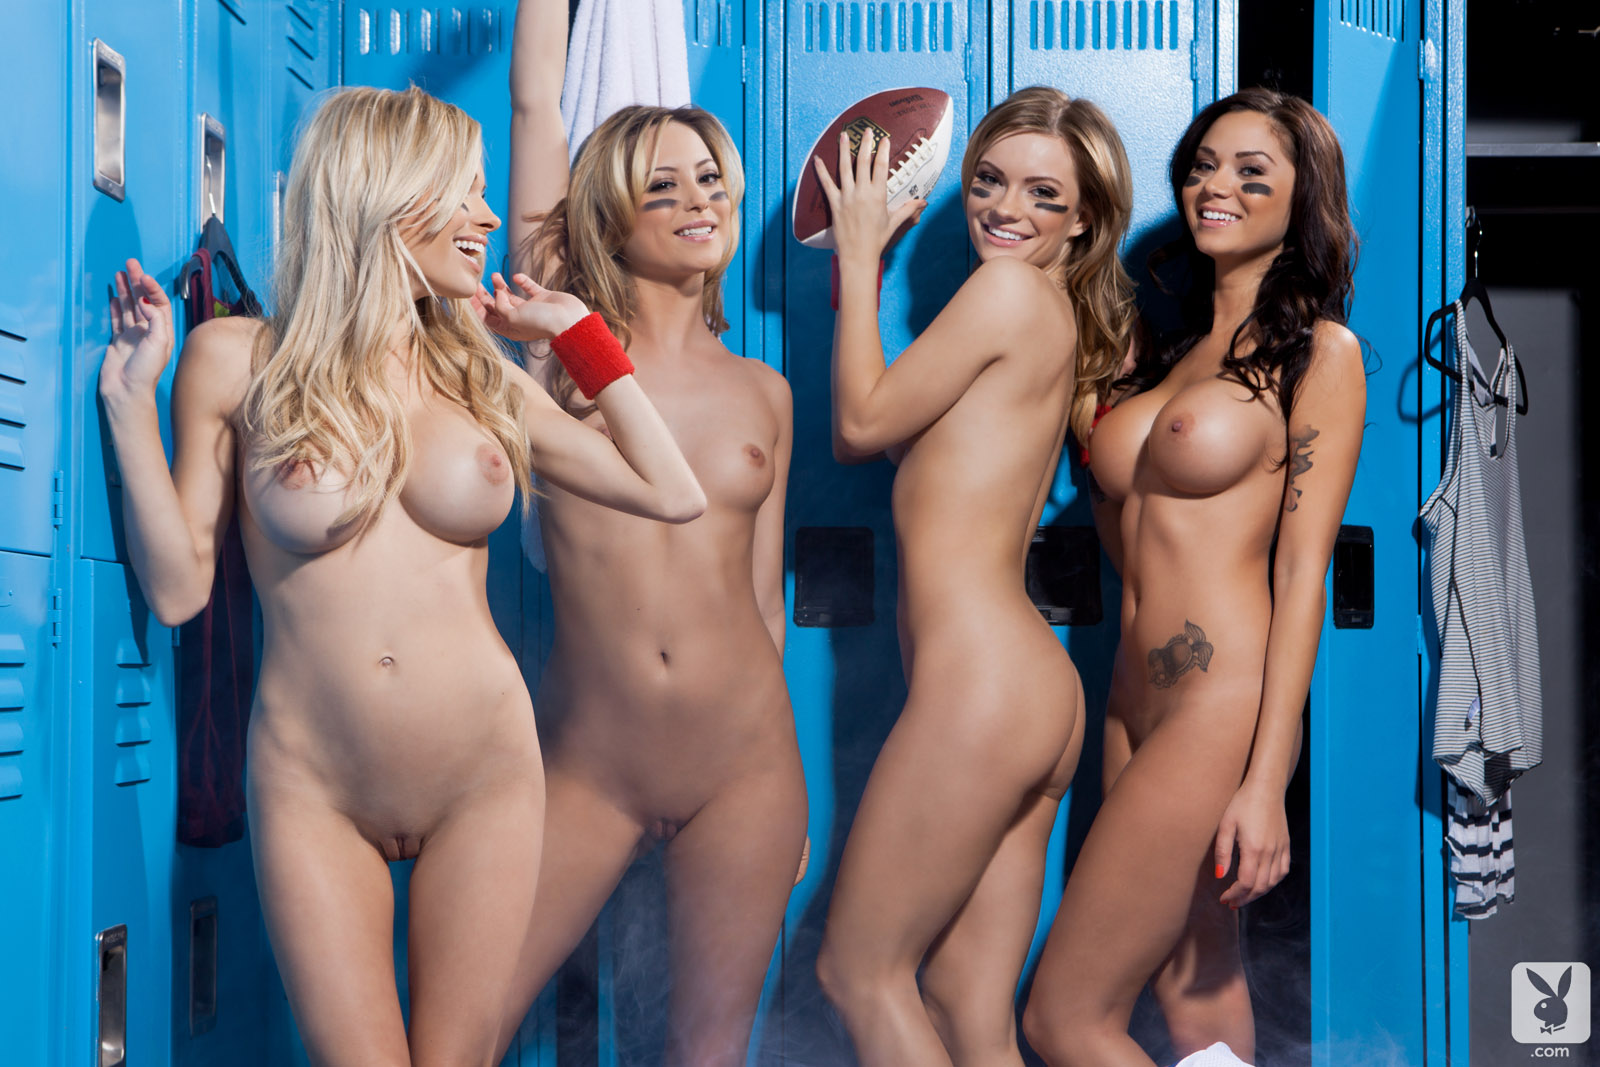 Girls locker room nude selfie